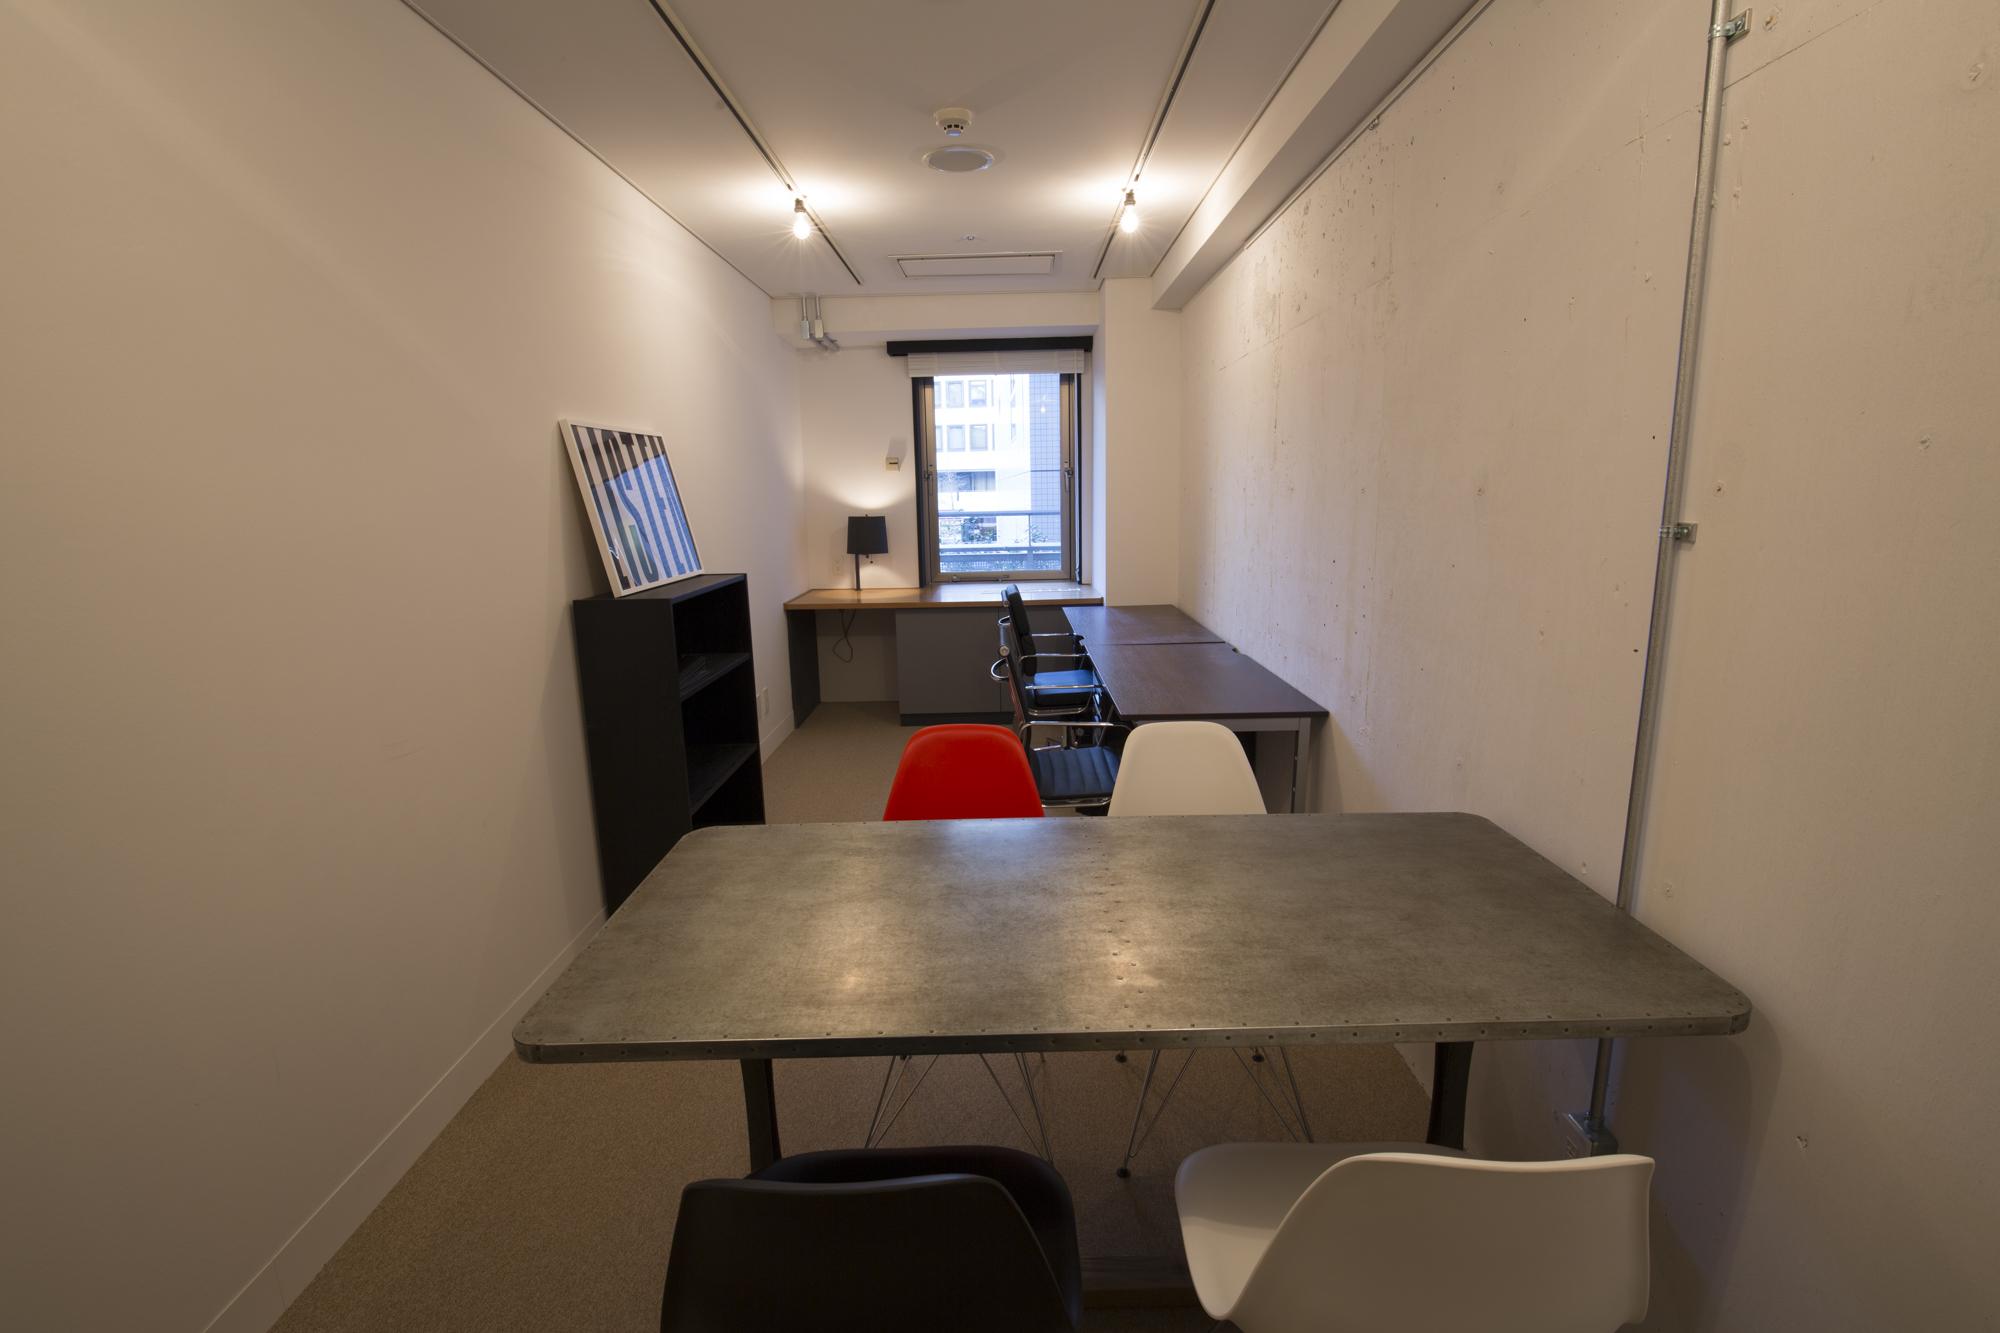 office 14㎡台~16㎡台 床:躯体表し,クリア塗装 Layout image